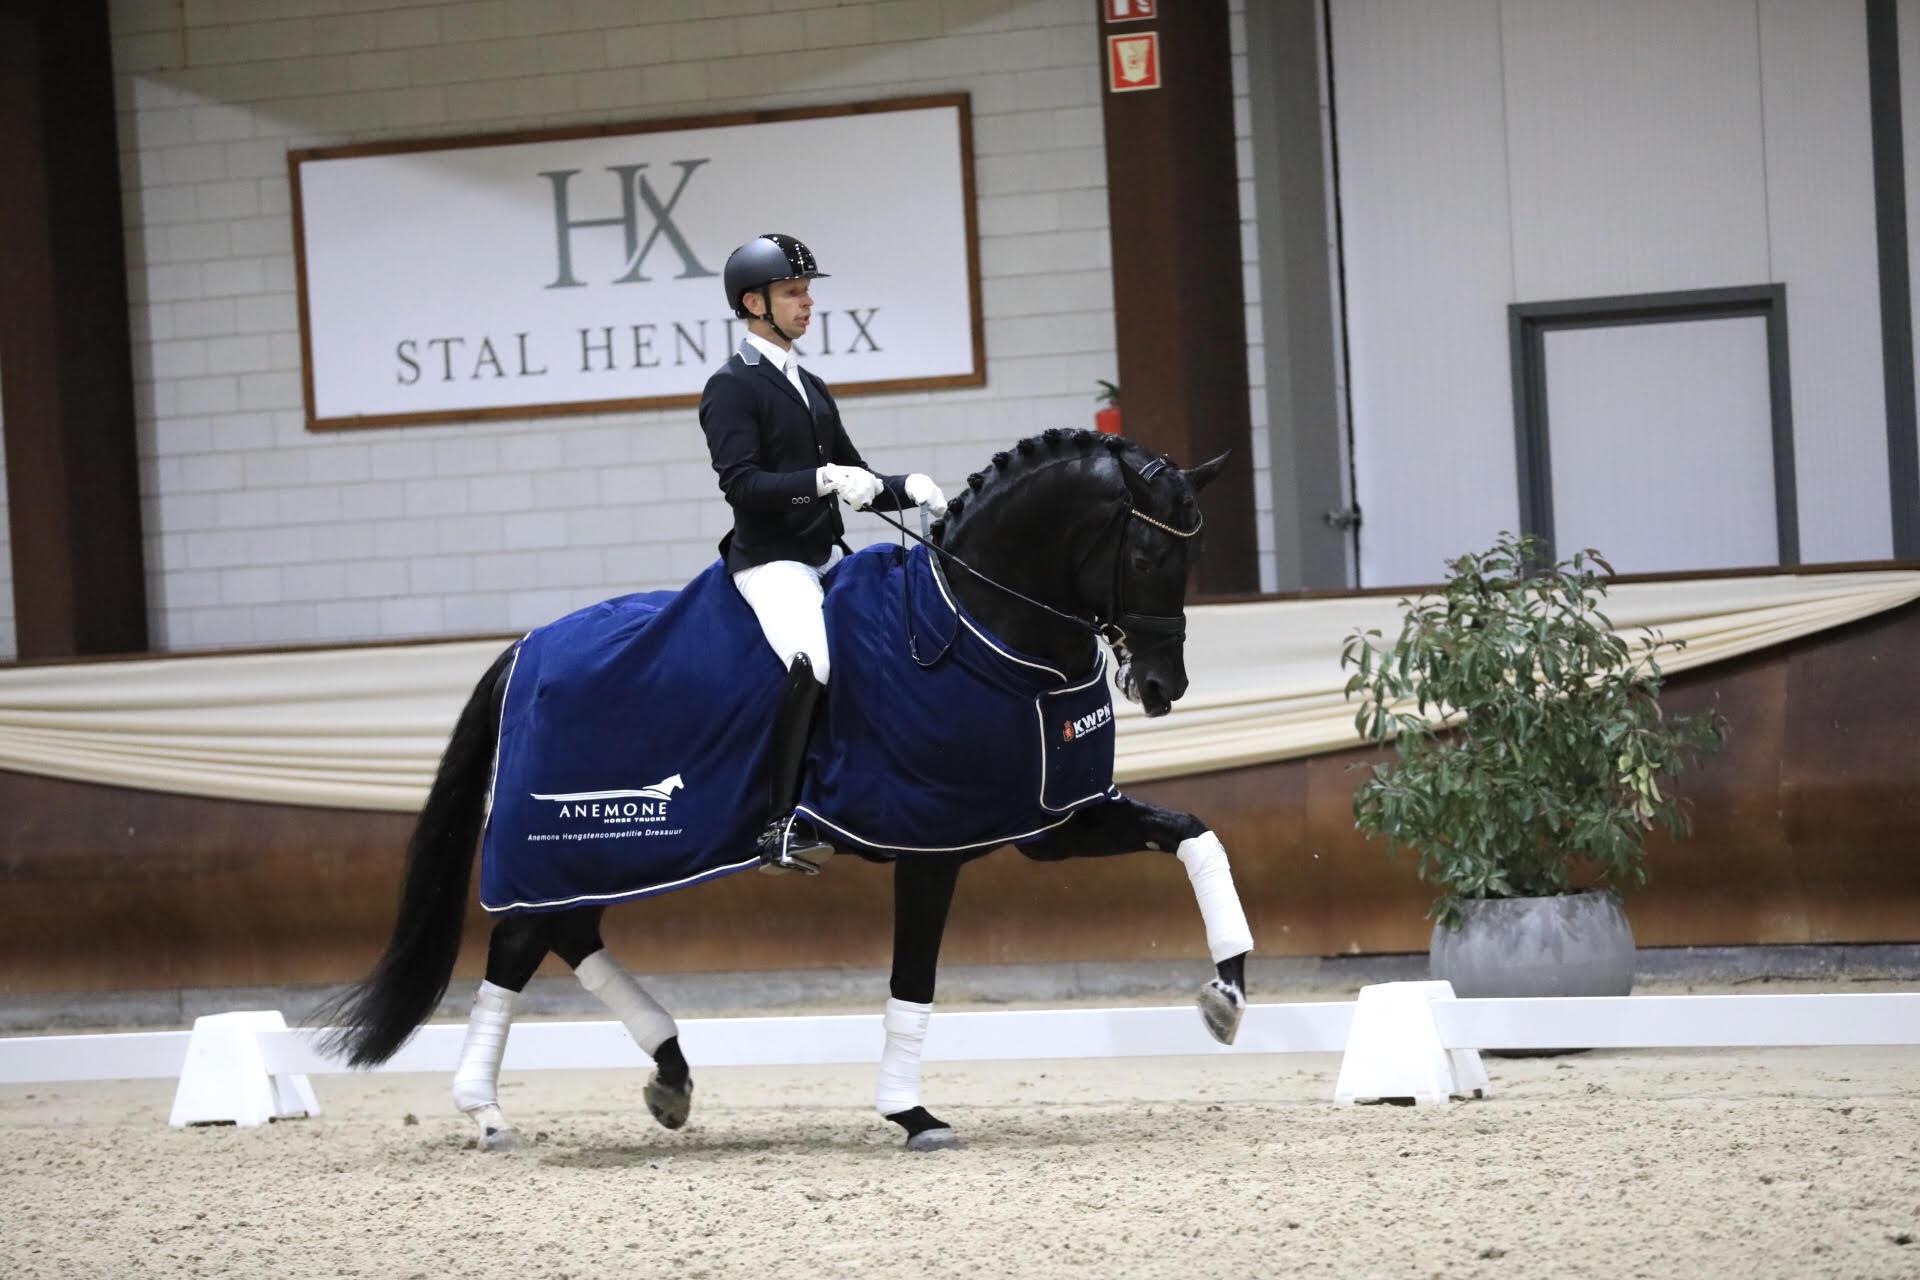 Imposantos maakt favorietenrol waar in Anemone Hengstencompetitie Kronenberg - Horses.nl